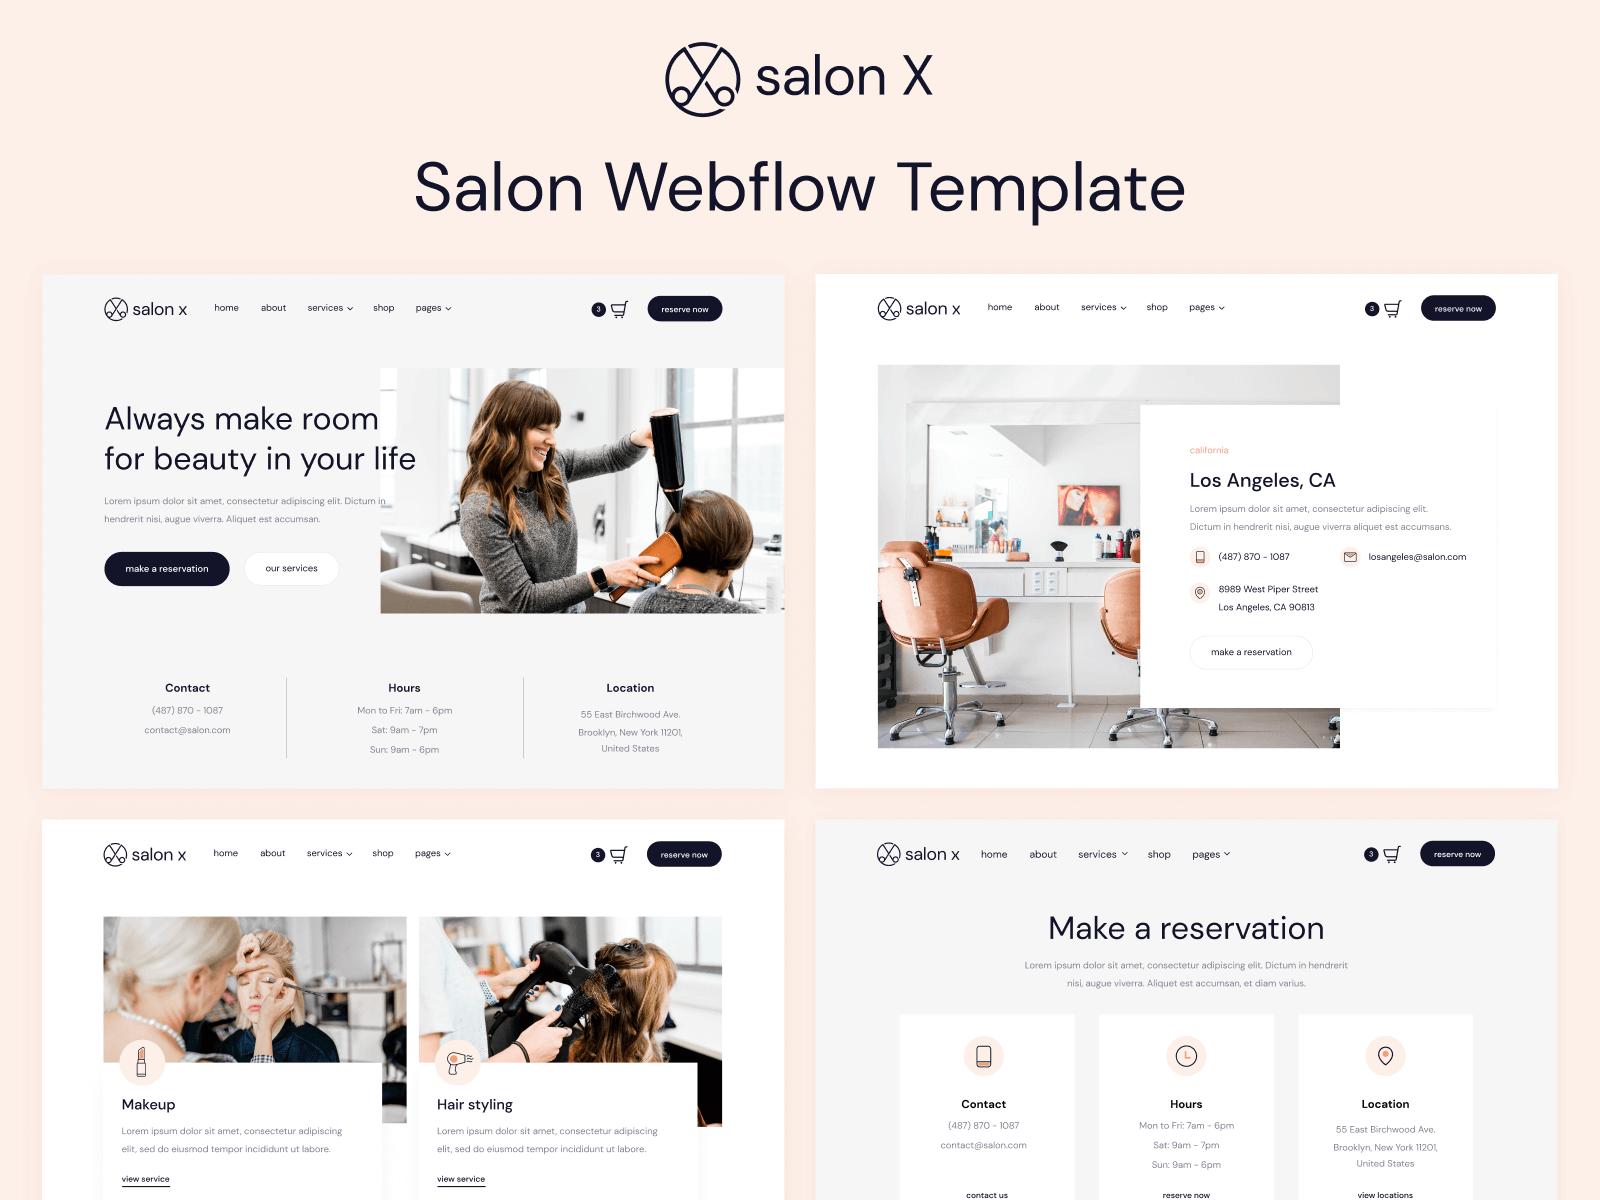 Salon Webflow Template